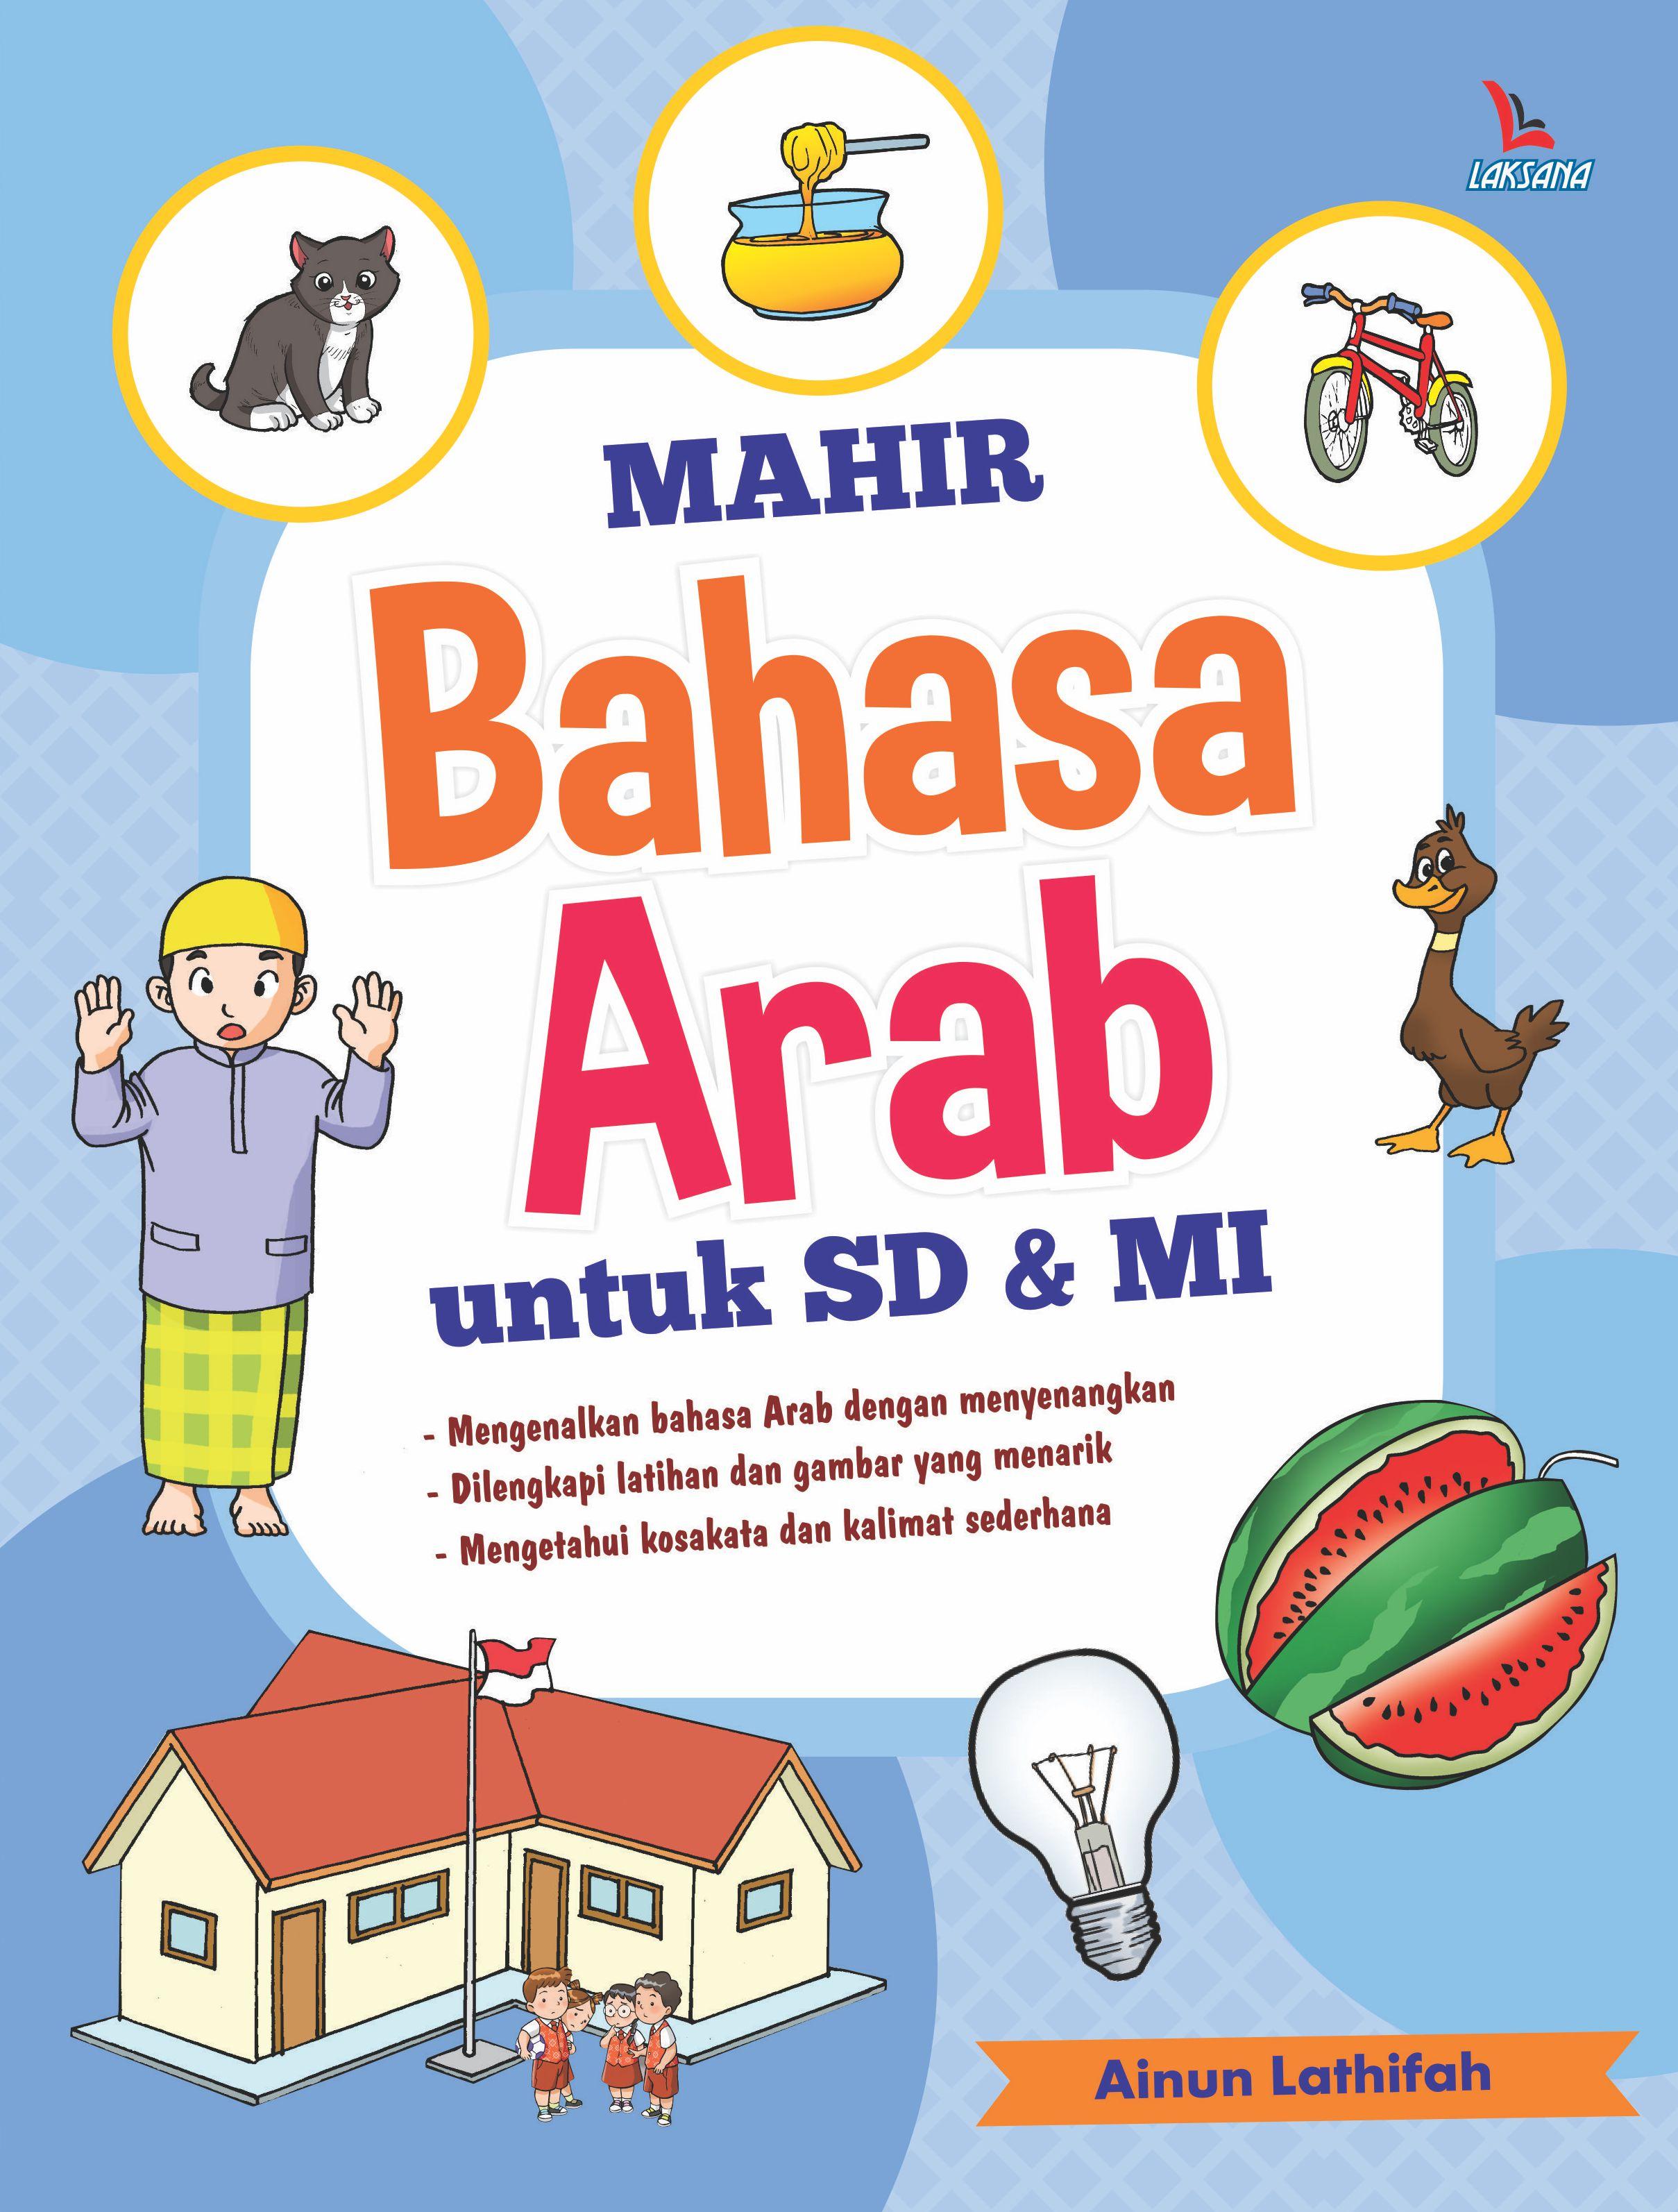 Mahir bahasa arab untuk SD & MI [sumber elektronis]